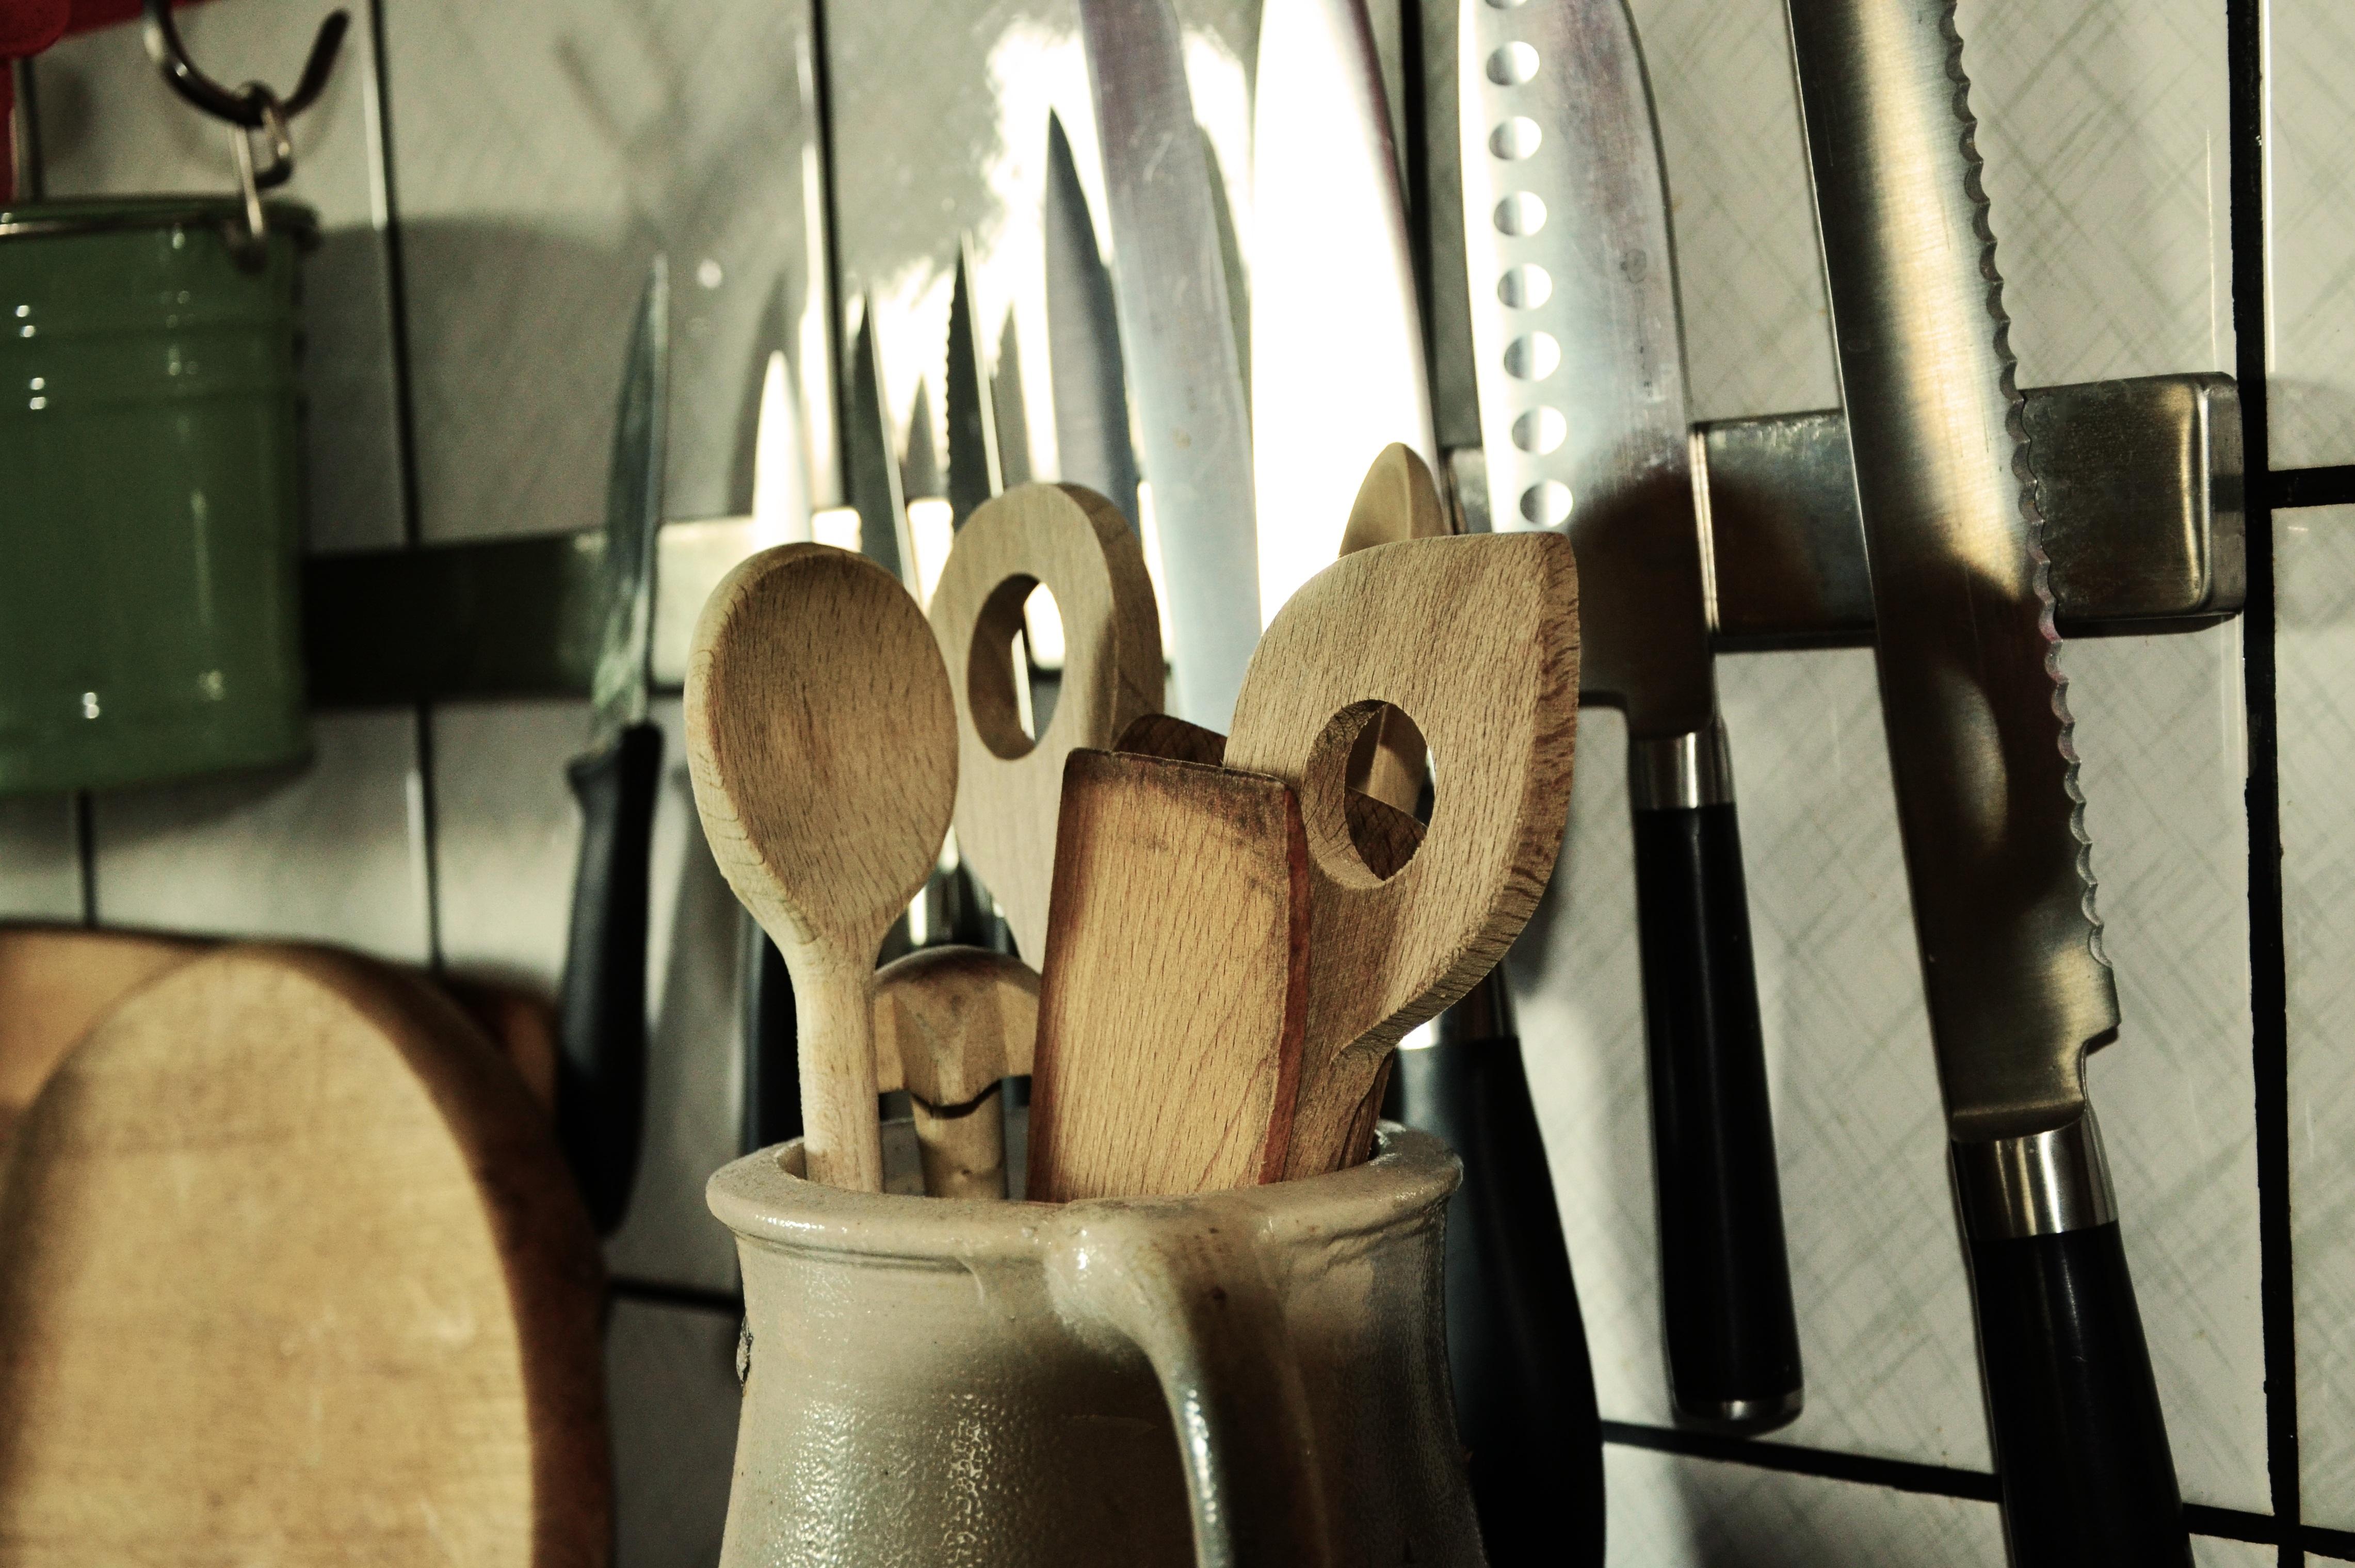 Kostenlose foto : Holz, Küche, Beleuchtung, Waffe, Geschirr ...